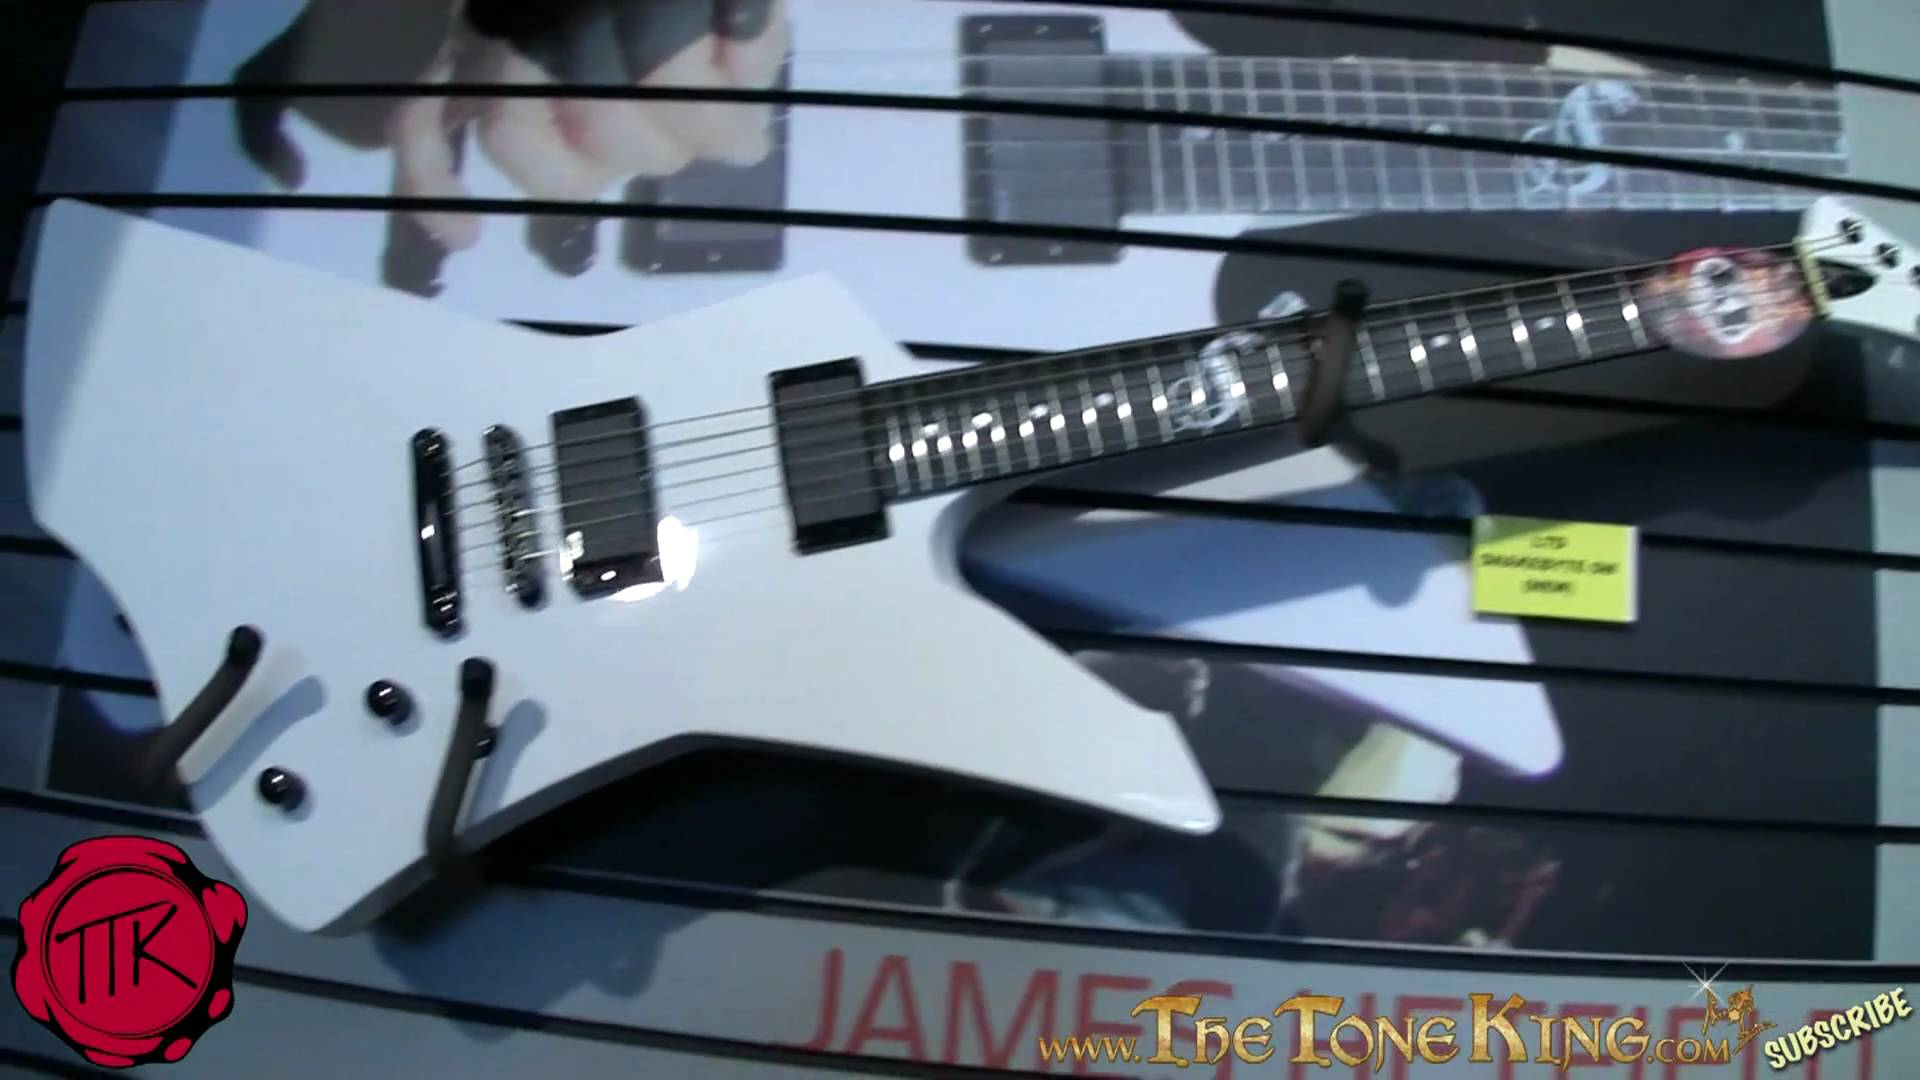 James Hetfield Guitar Wiring Diagram Electrical Diagrams Explorer Esp Ltd Snakebyte Signature Series The